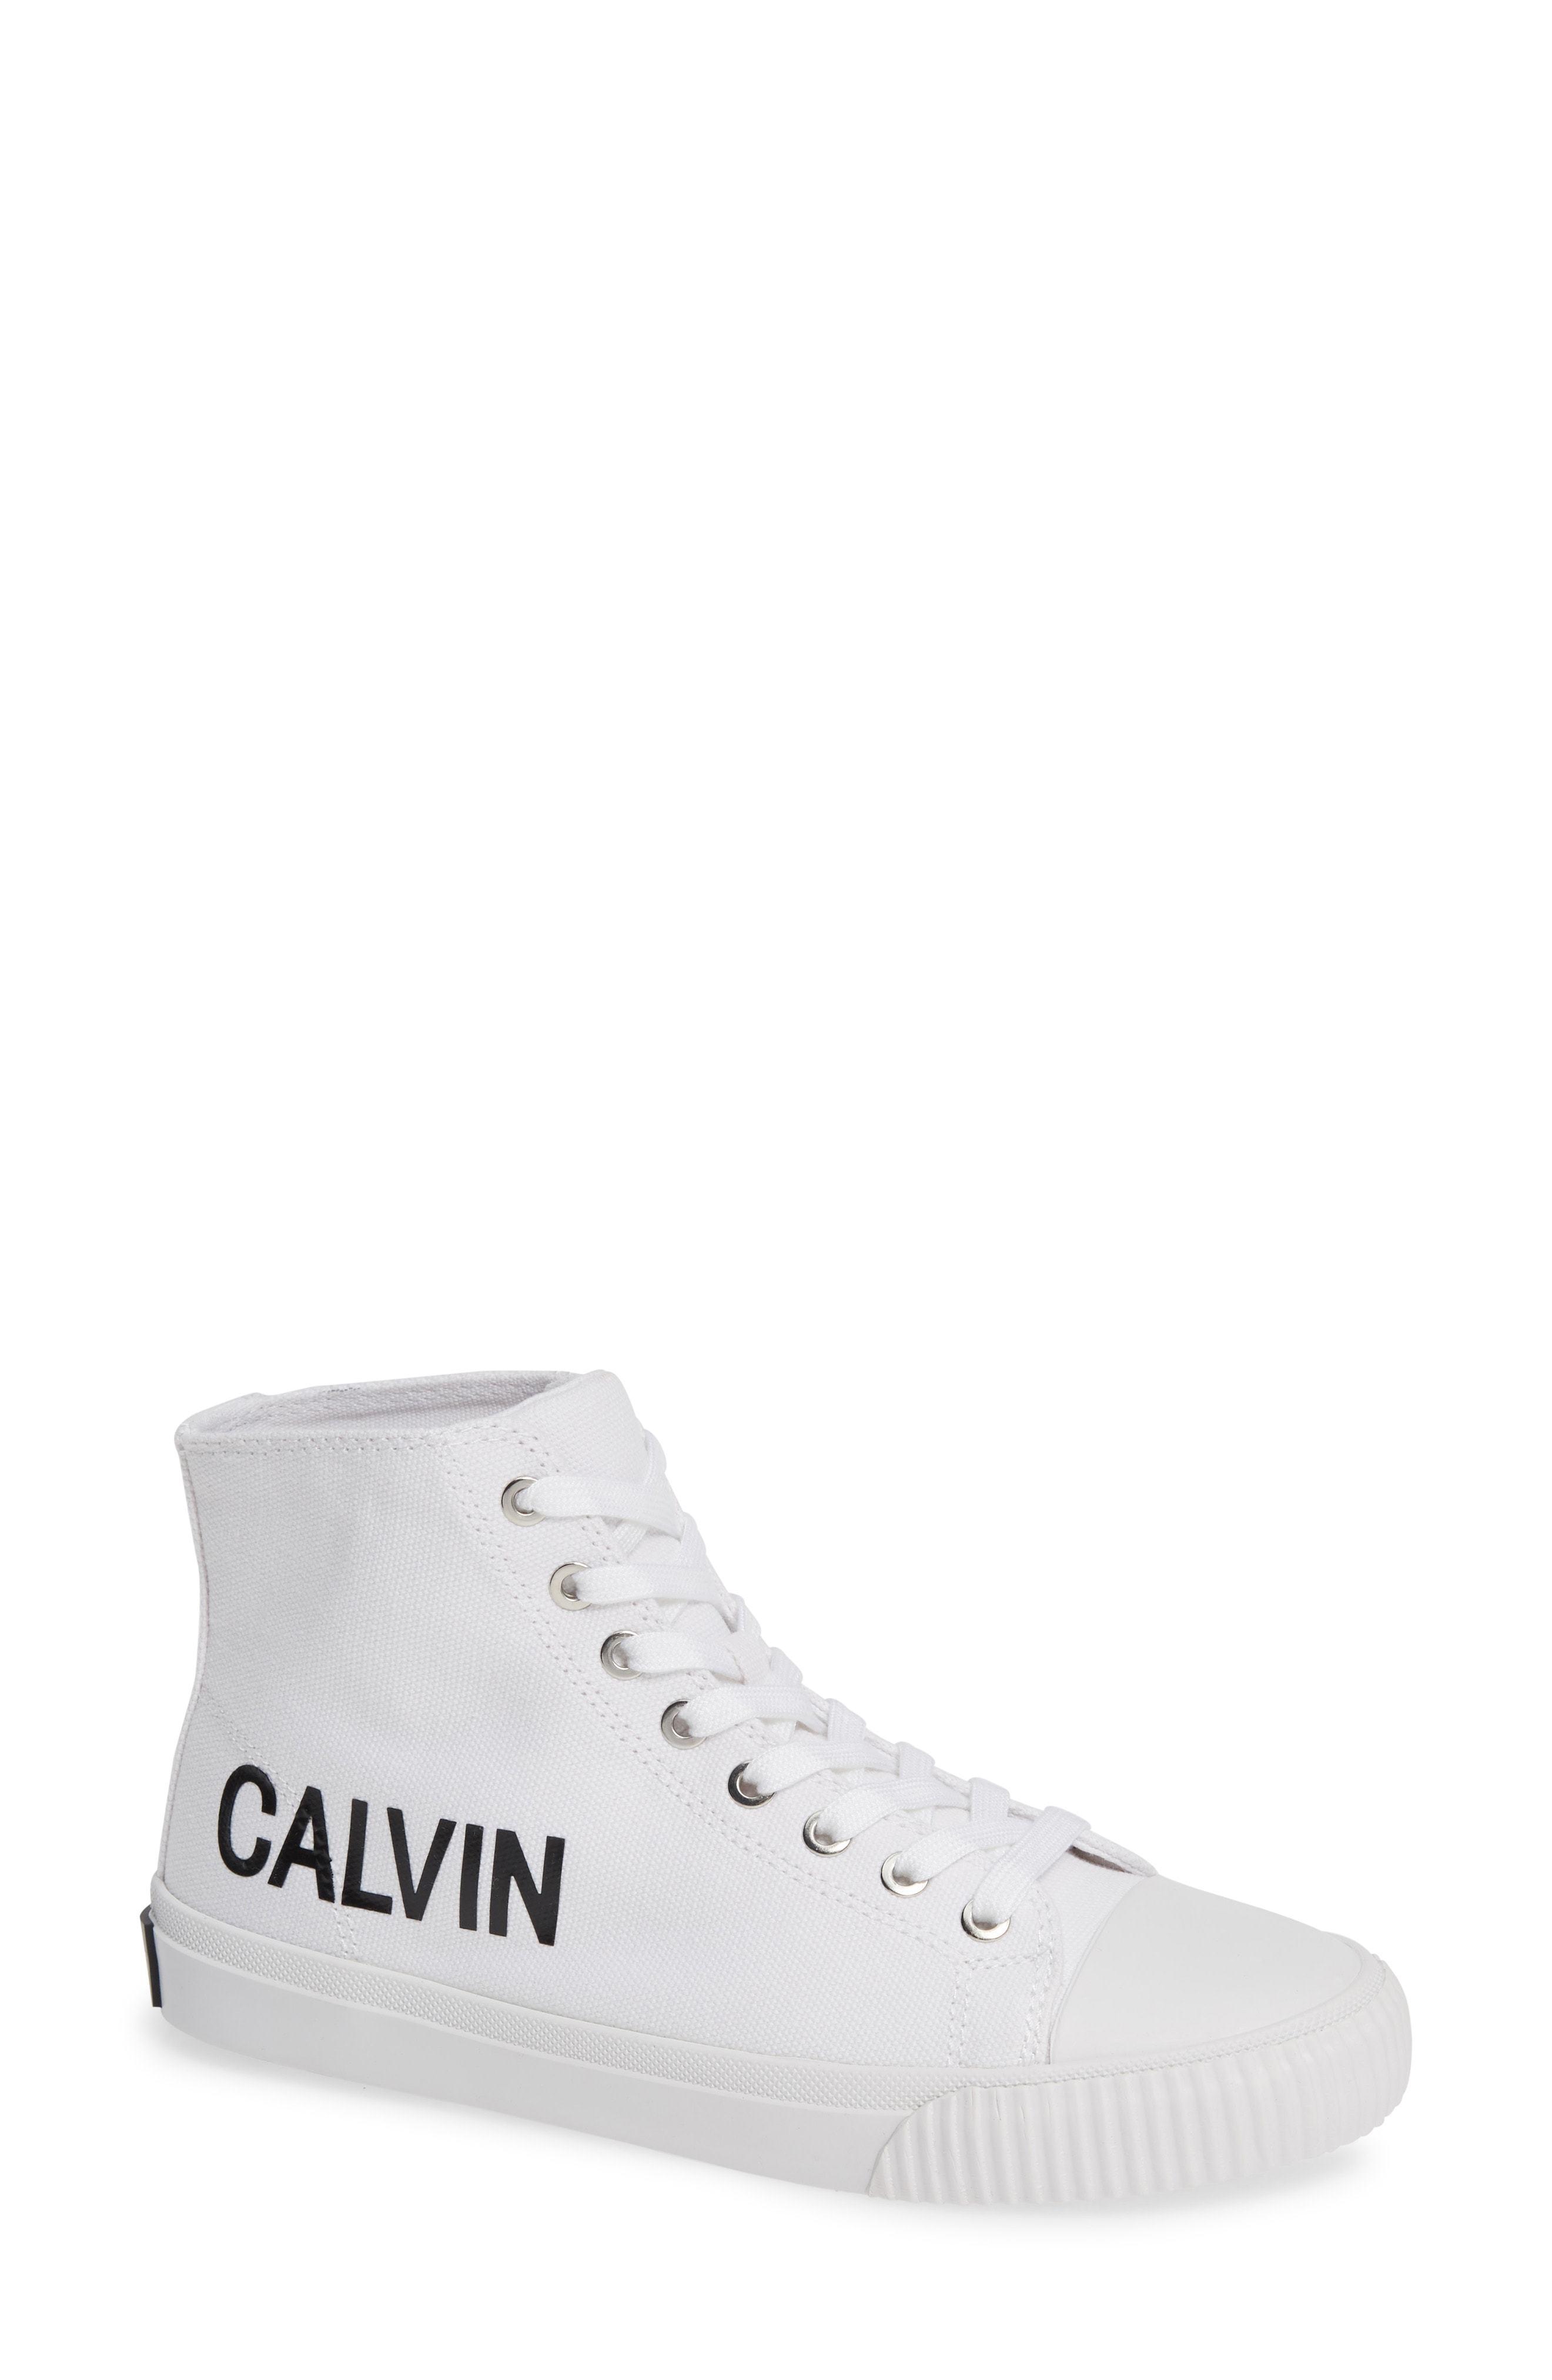 Calvin Klein Jeans Iole High Top